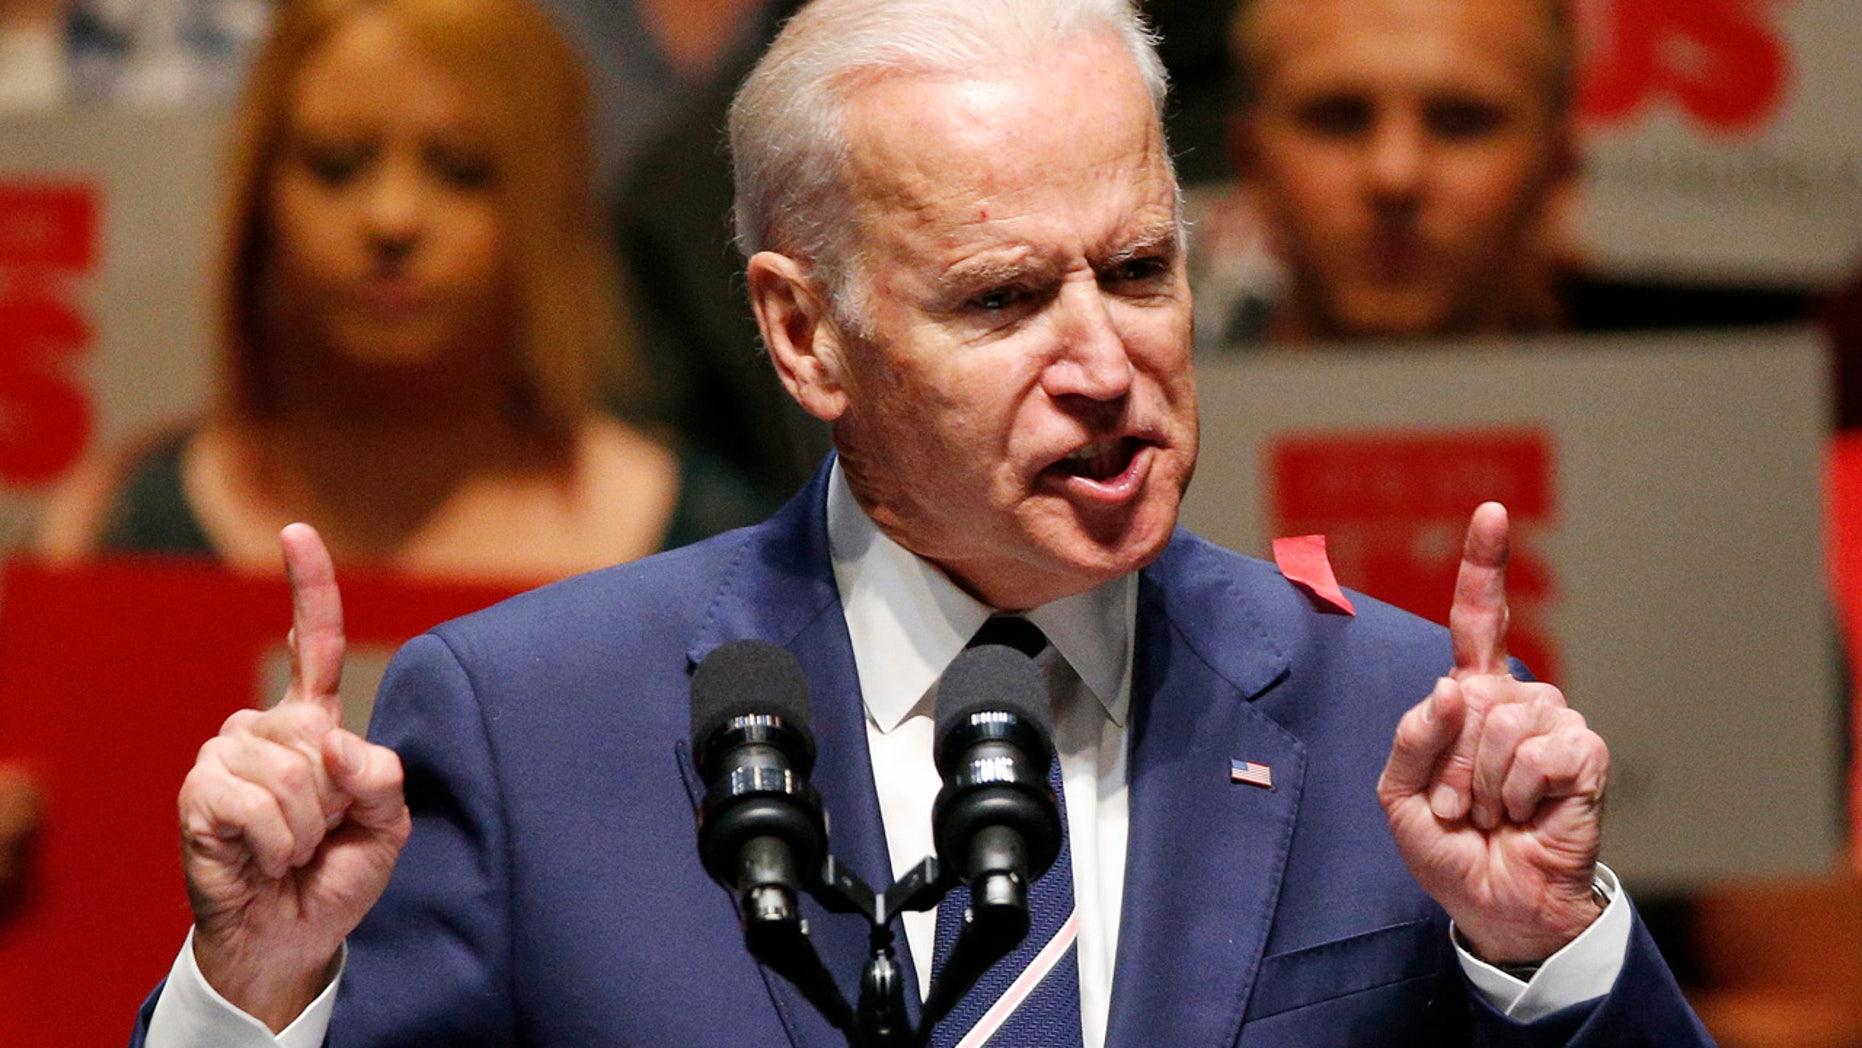 April 7, 2016: Vice President Joe Biden speaks at an event in Las Vegas.